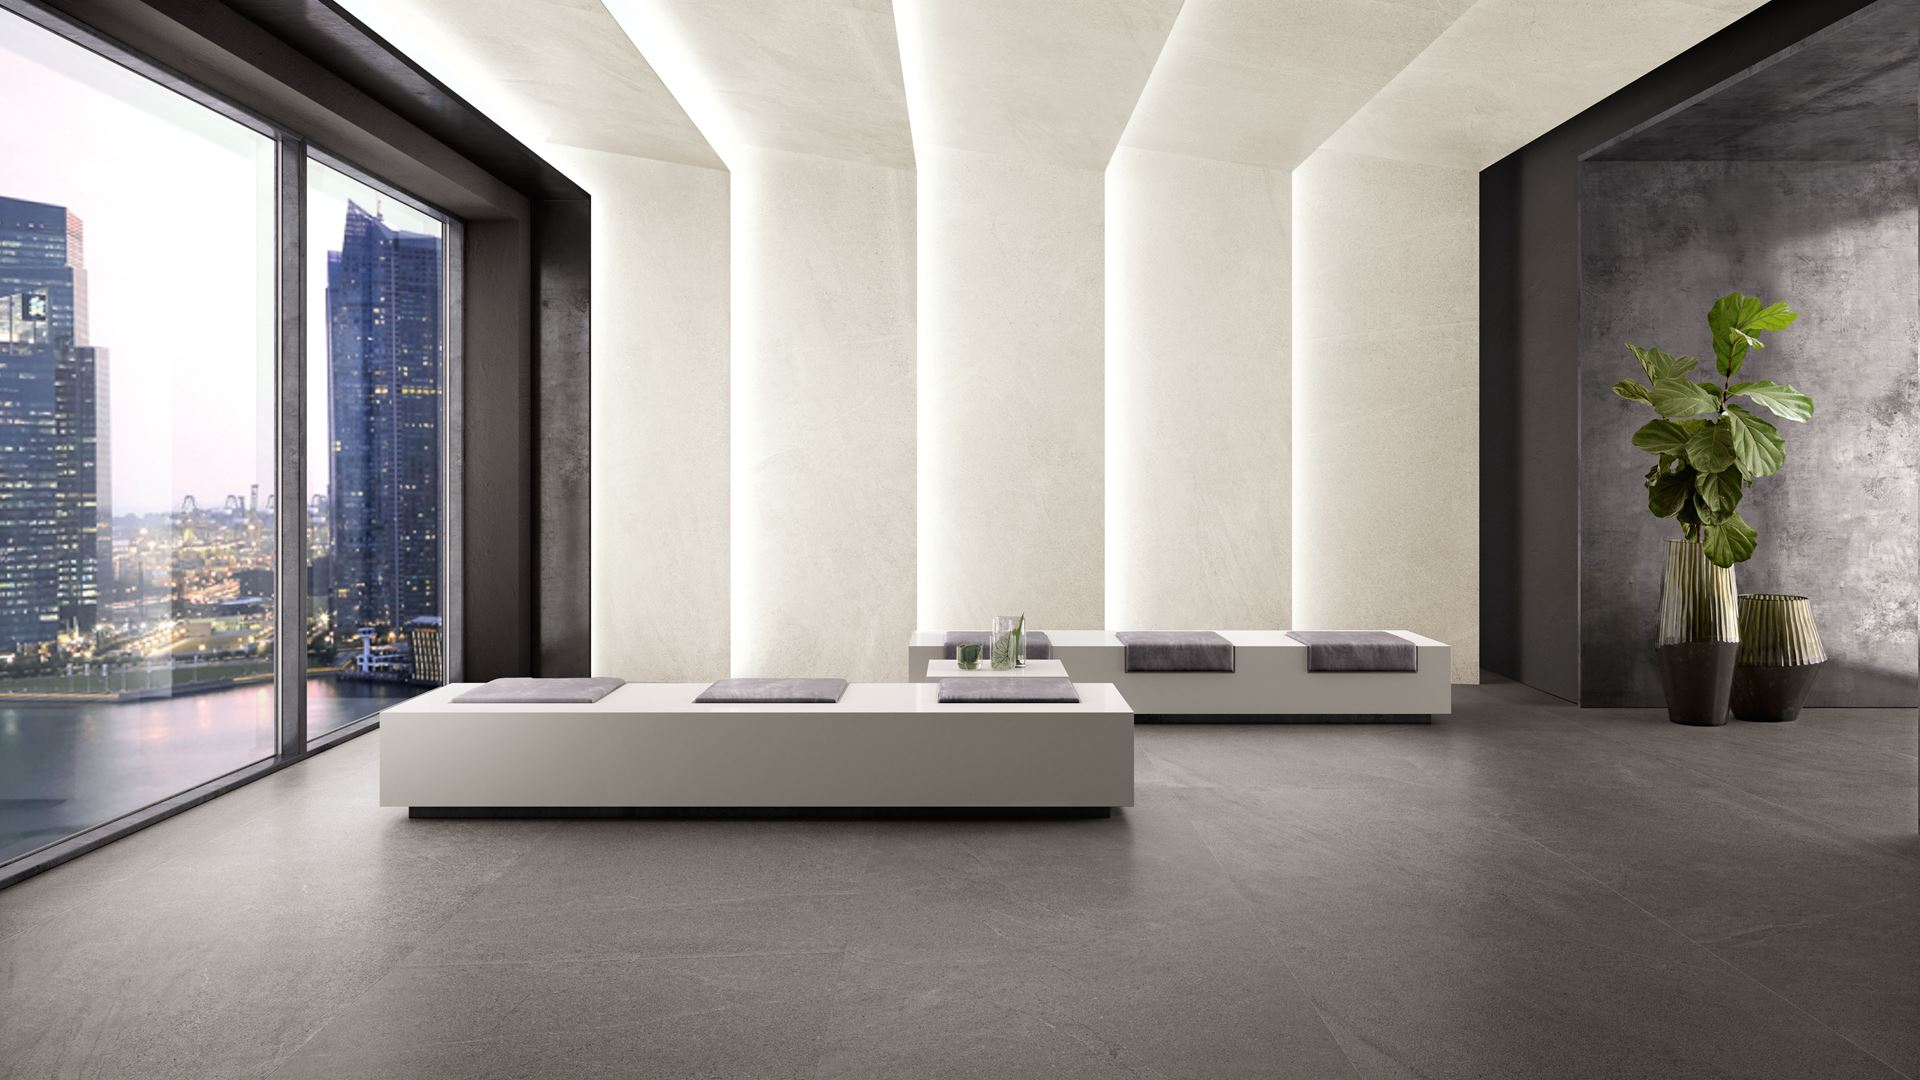 Kerlite Porcelain Tiles And Kerlite For Floors And Walls